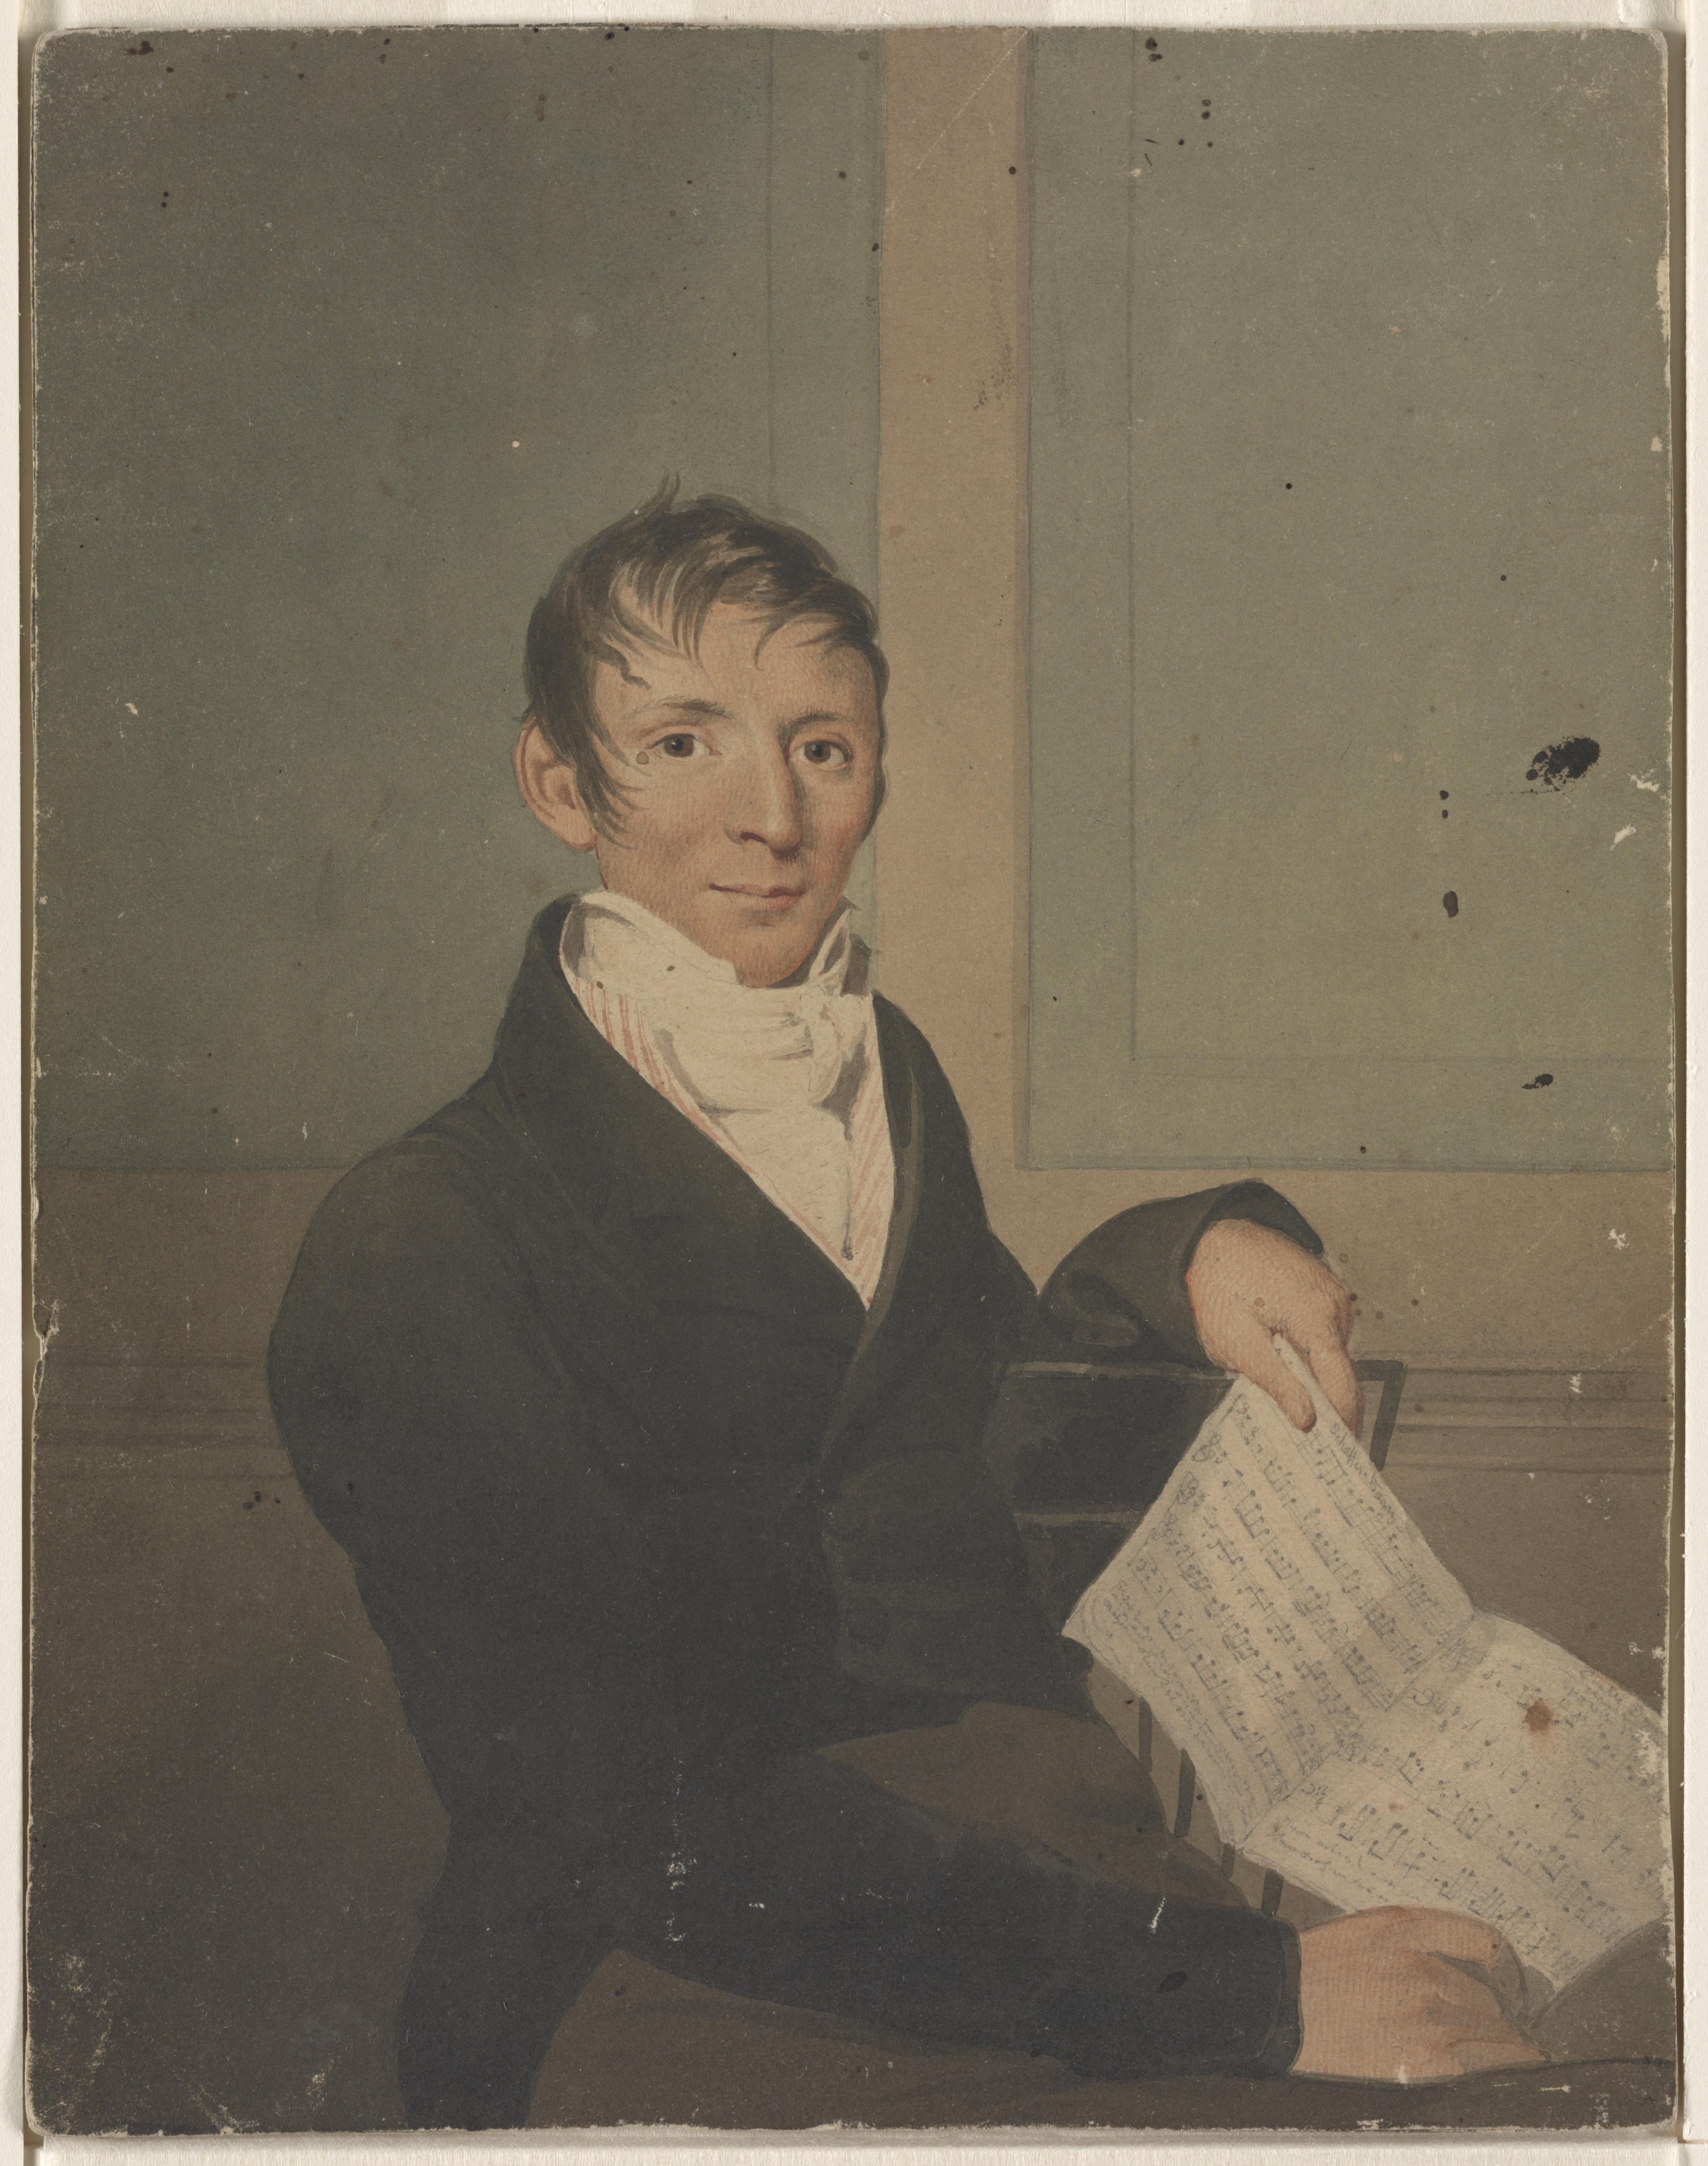 Portrait of Gottlieb Graupner by John Rubens Smith, 1809 (Library of Congress)